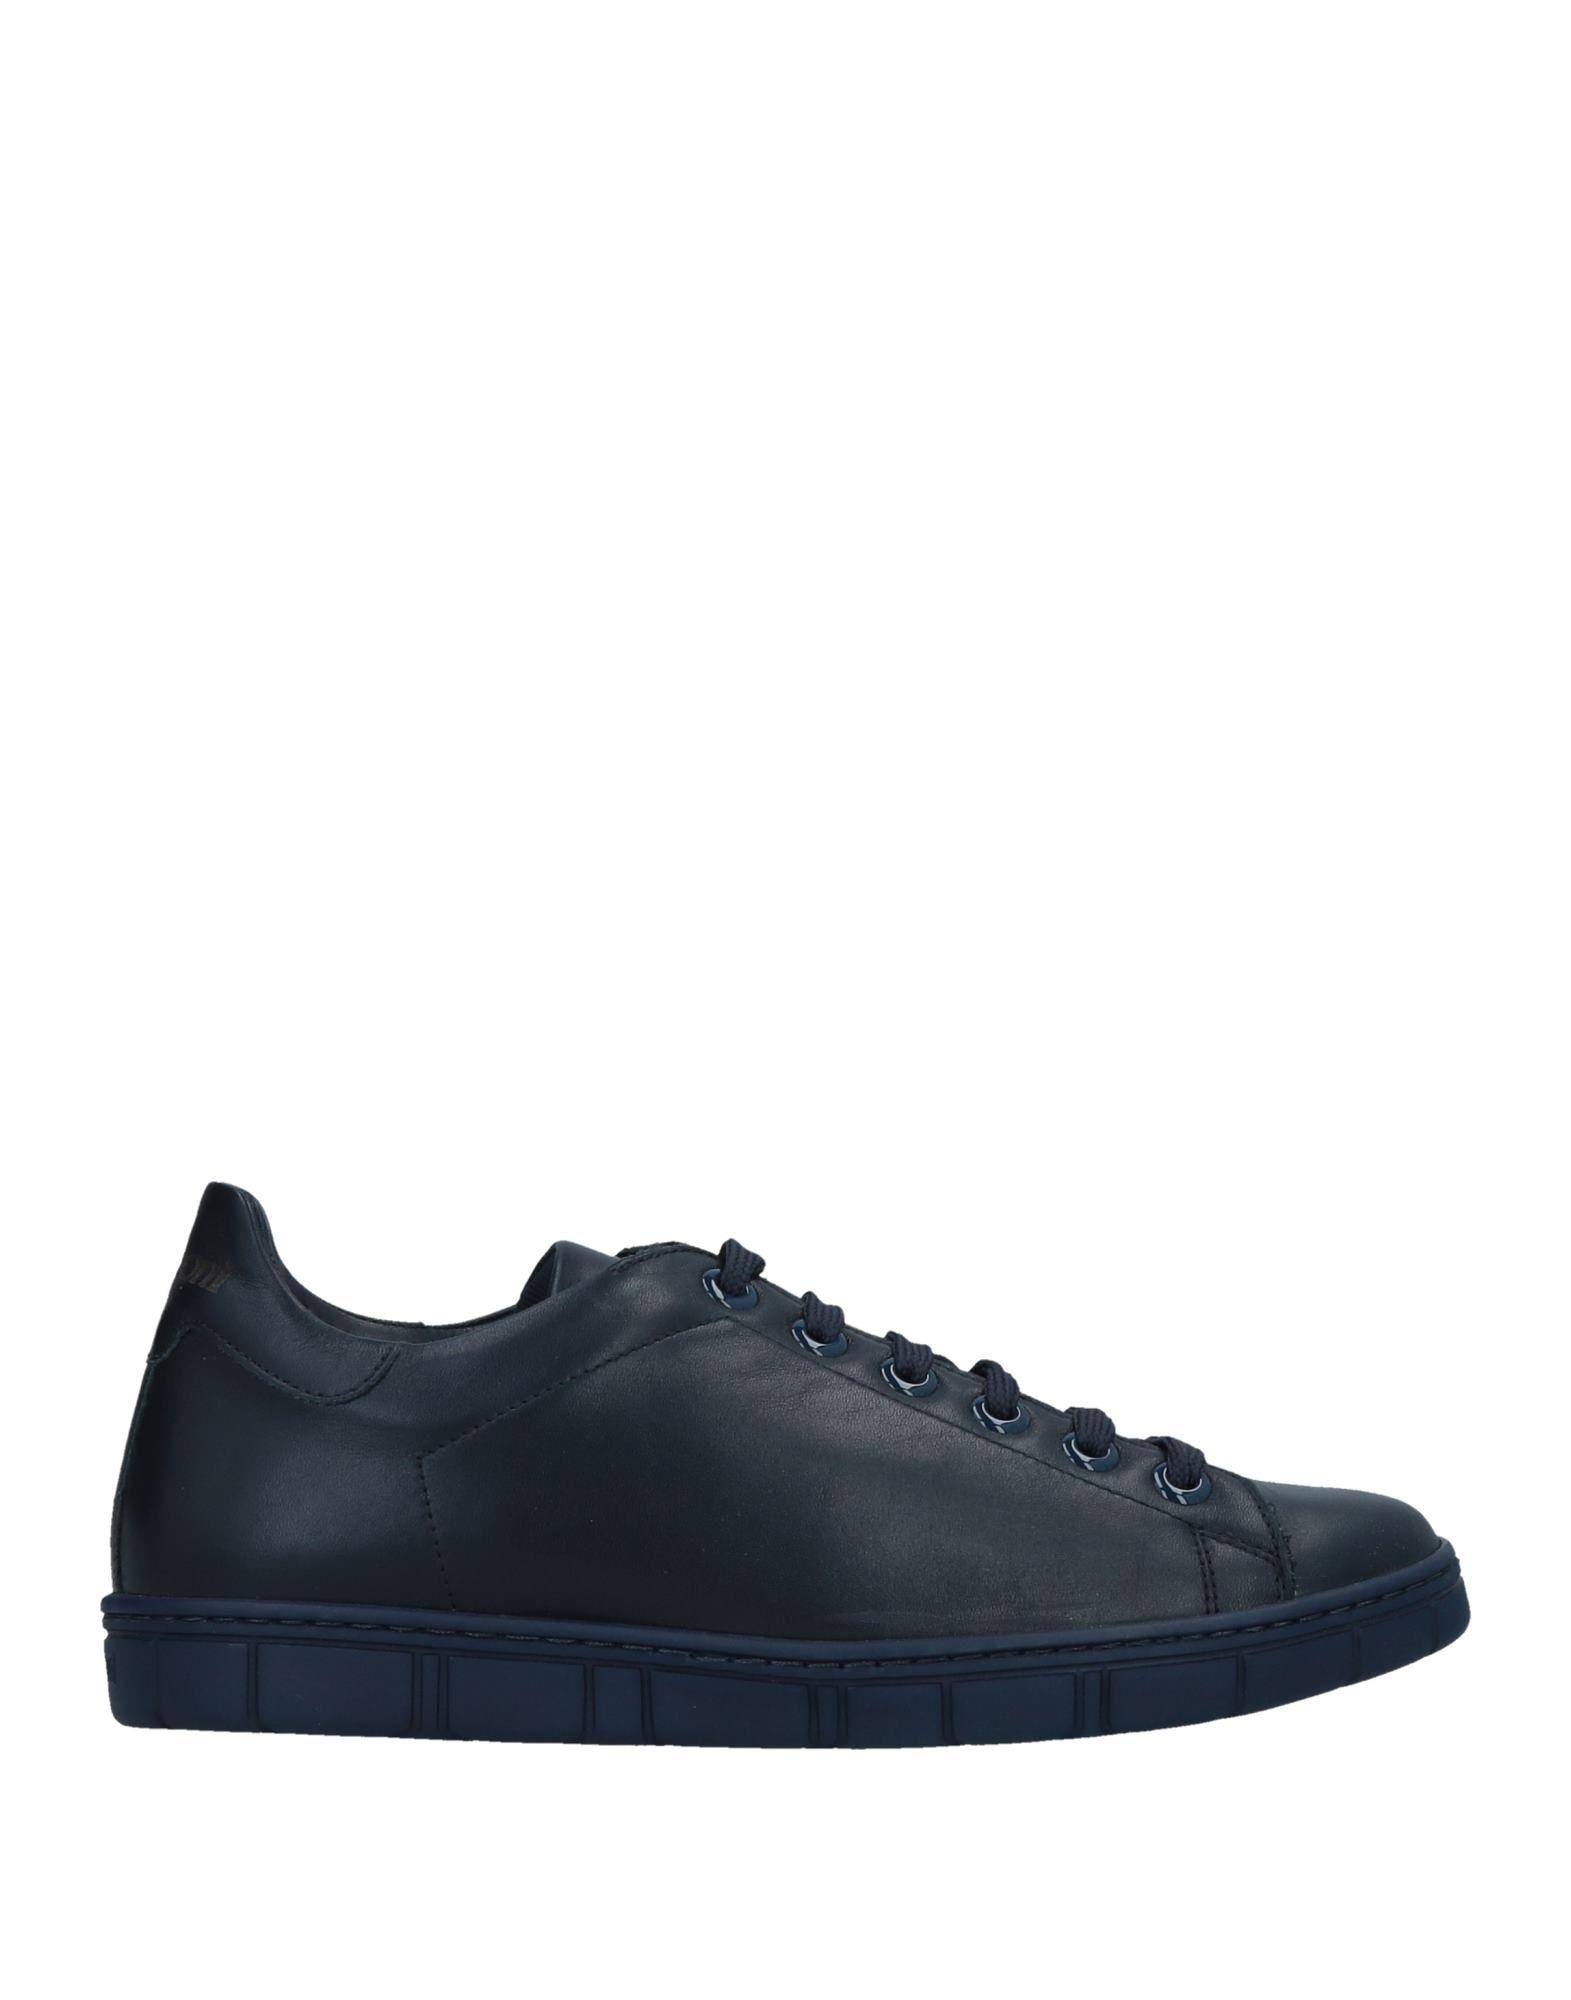 Moda 11504644NJ Sneakers A.Testoni Donna - 11504644NJ Moda 5ea8fd